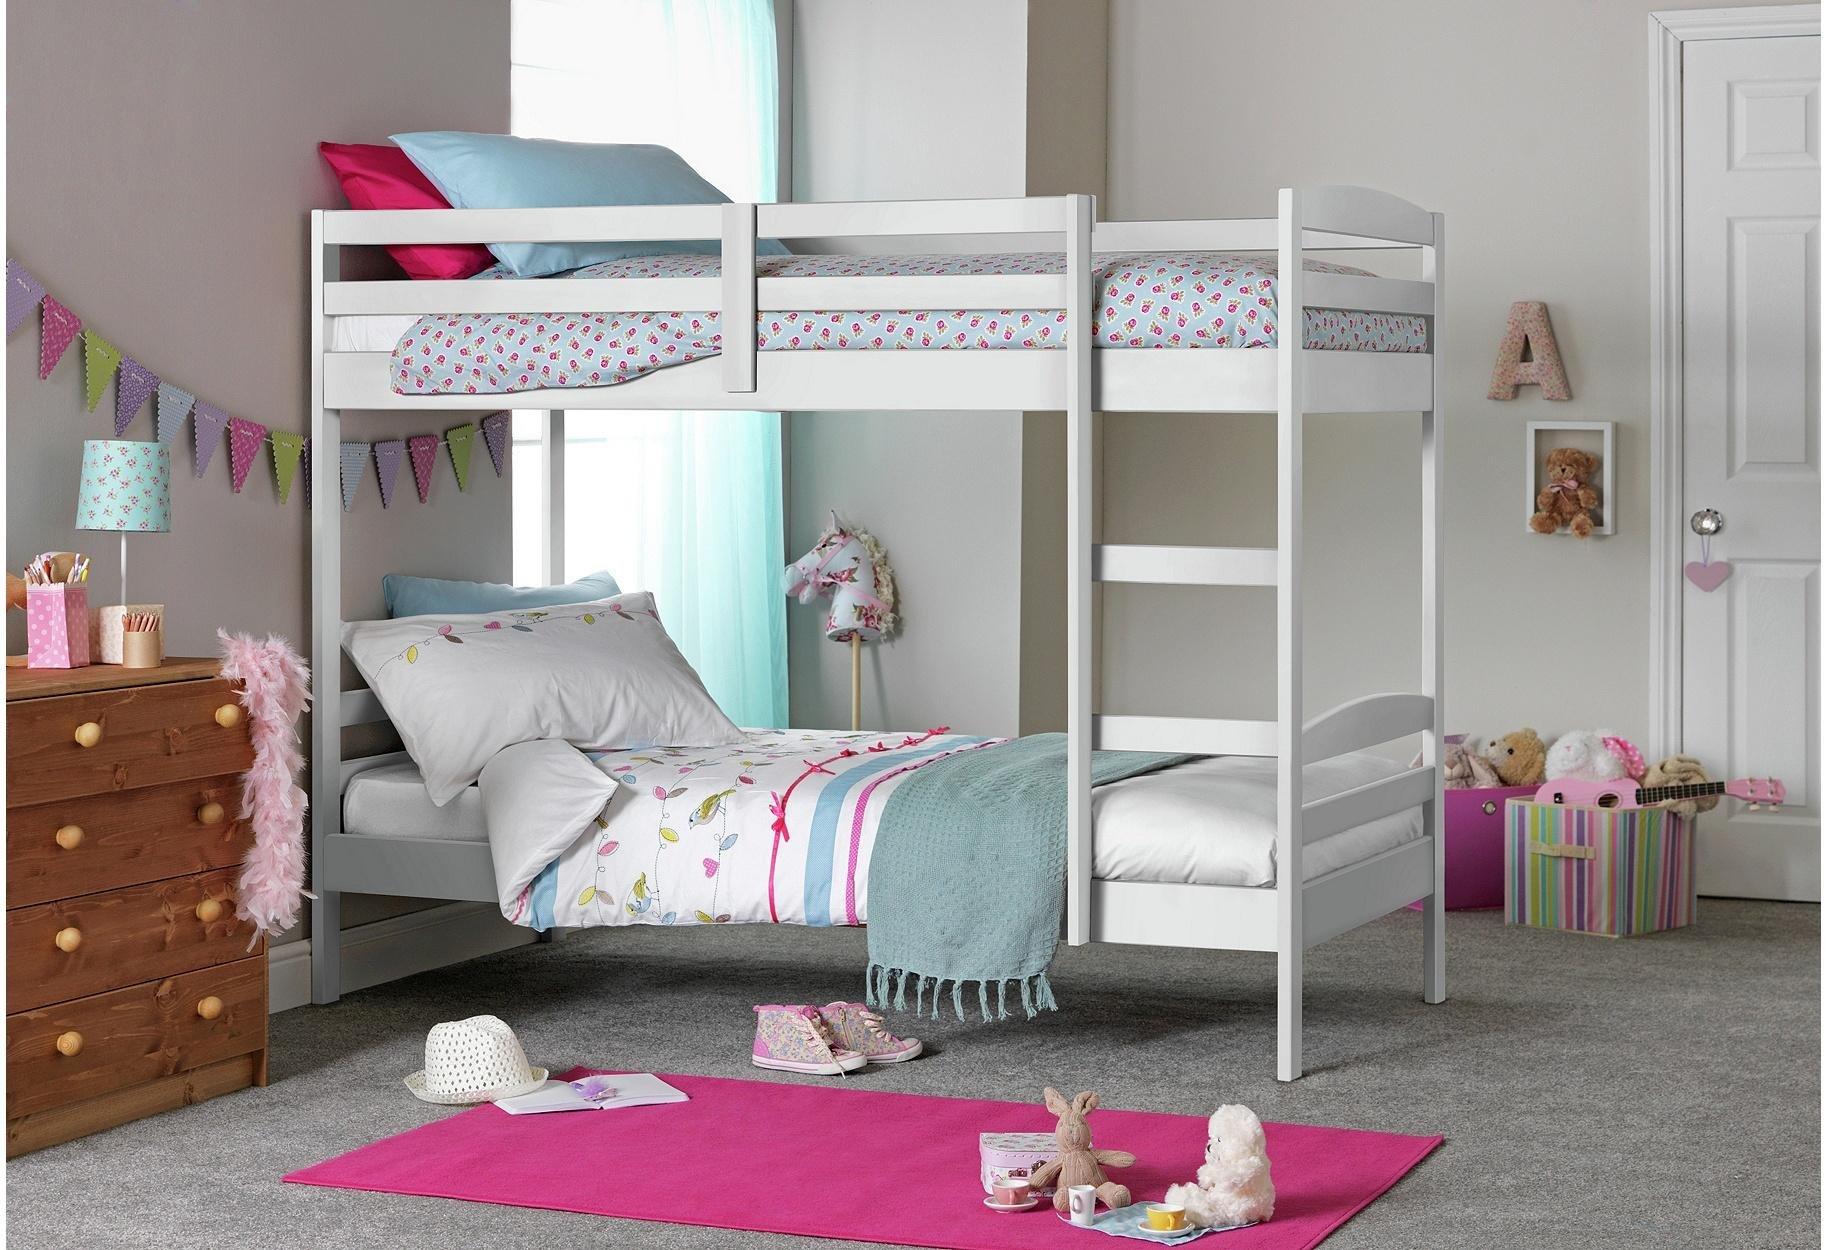 Argos Home Josie Shorty Bunk Bed Frame - White